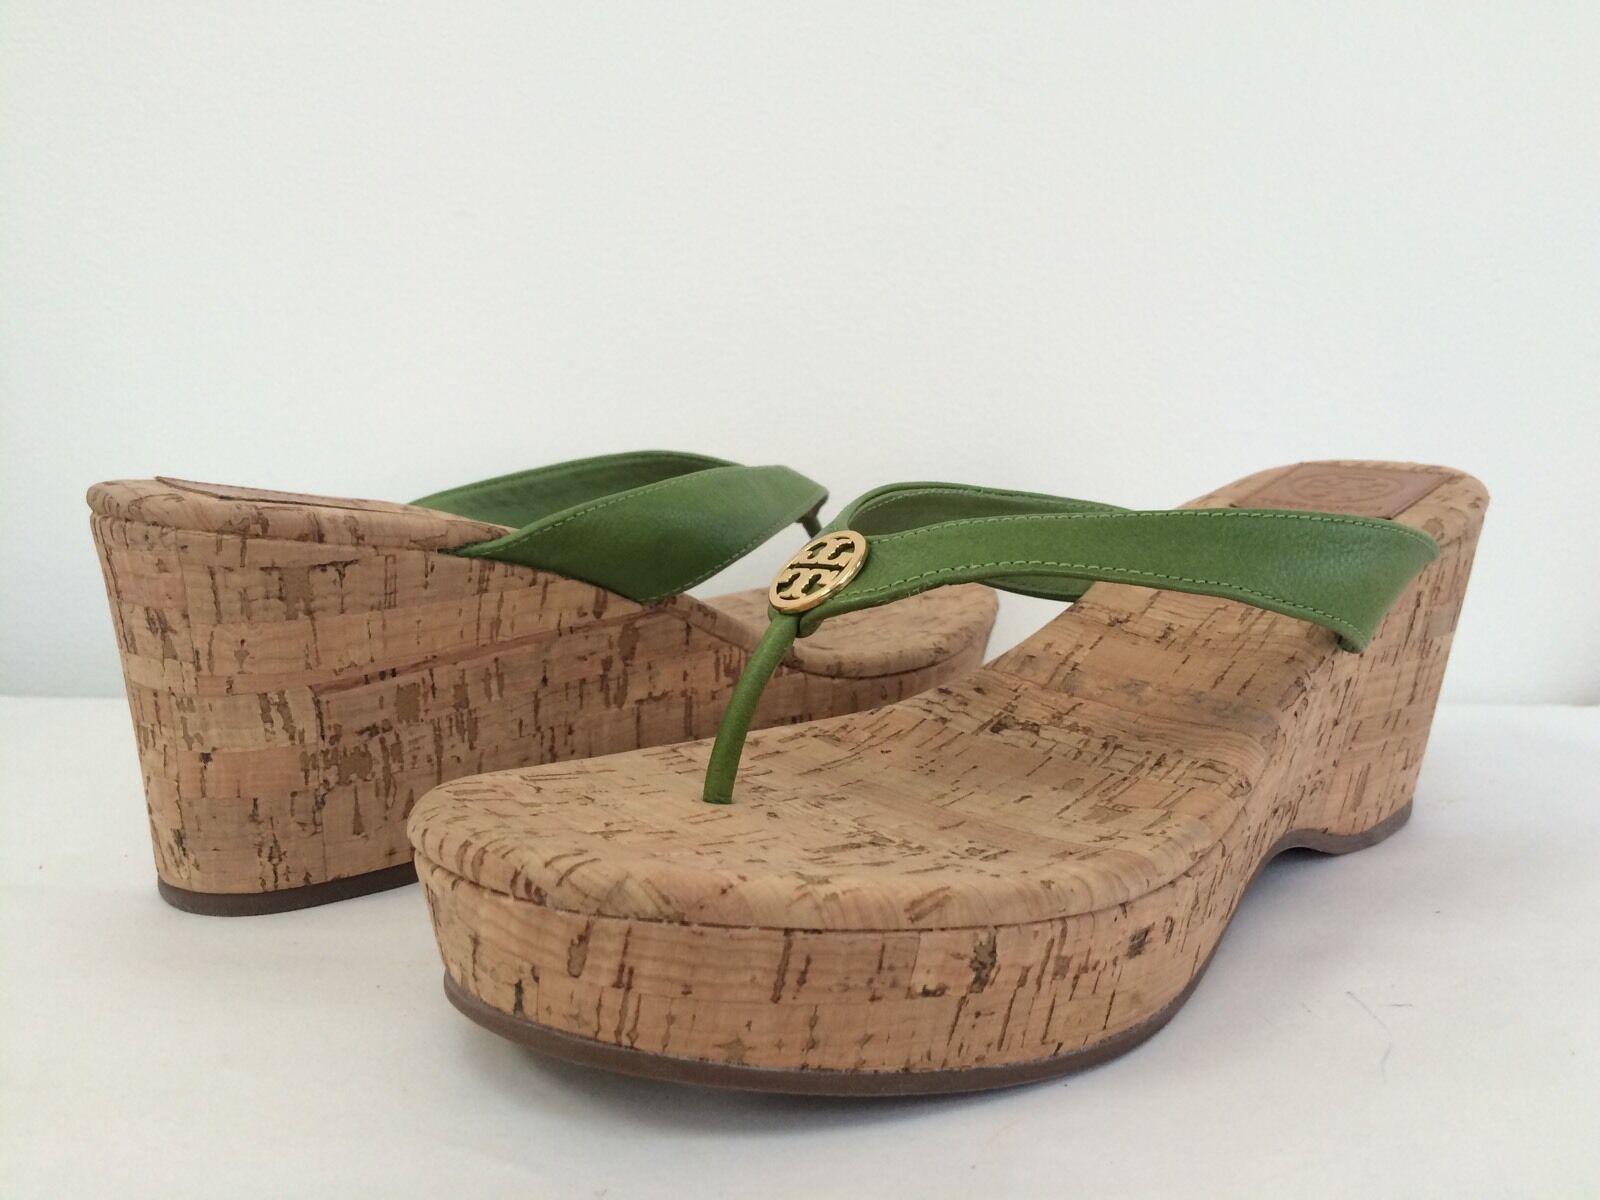 NEU Tory Burch 11M Reva Suzy Leaf Green Cork Wedge Thong Sandale Platform Tori